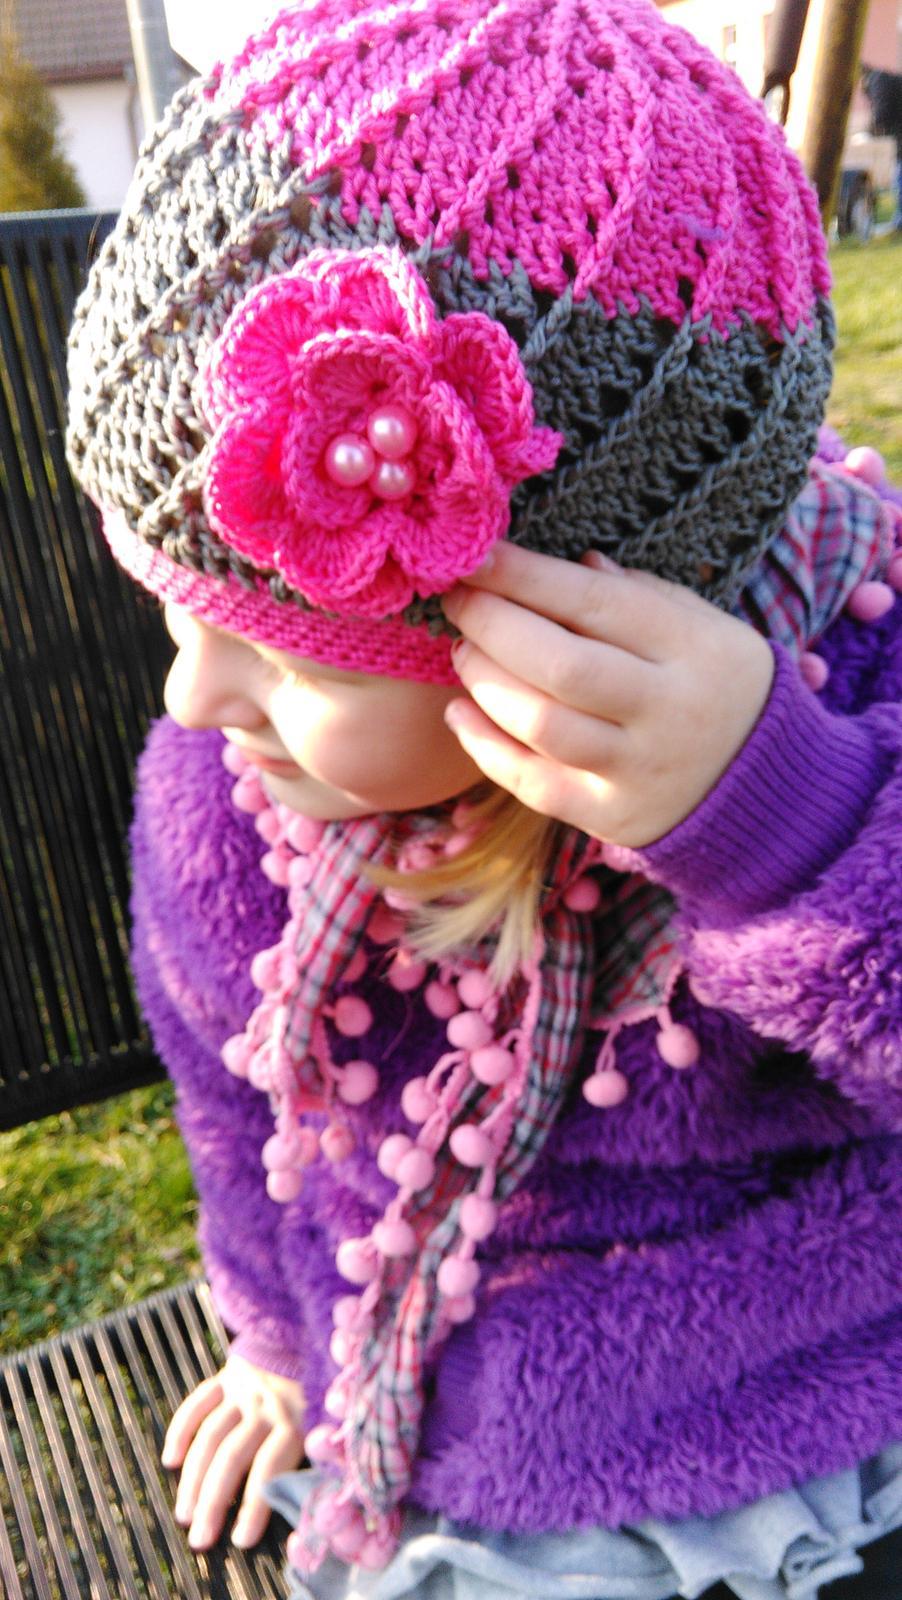 Šije šije  .....i háčkuje .... iiiviii :-) - podařila se mi čepice i kytka. Malá má radost a já též